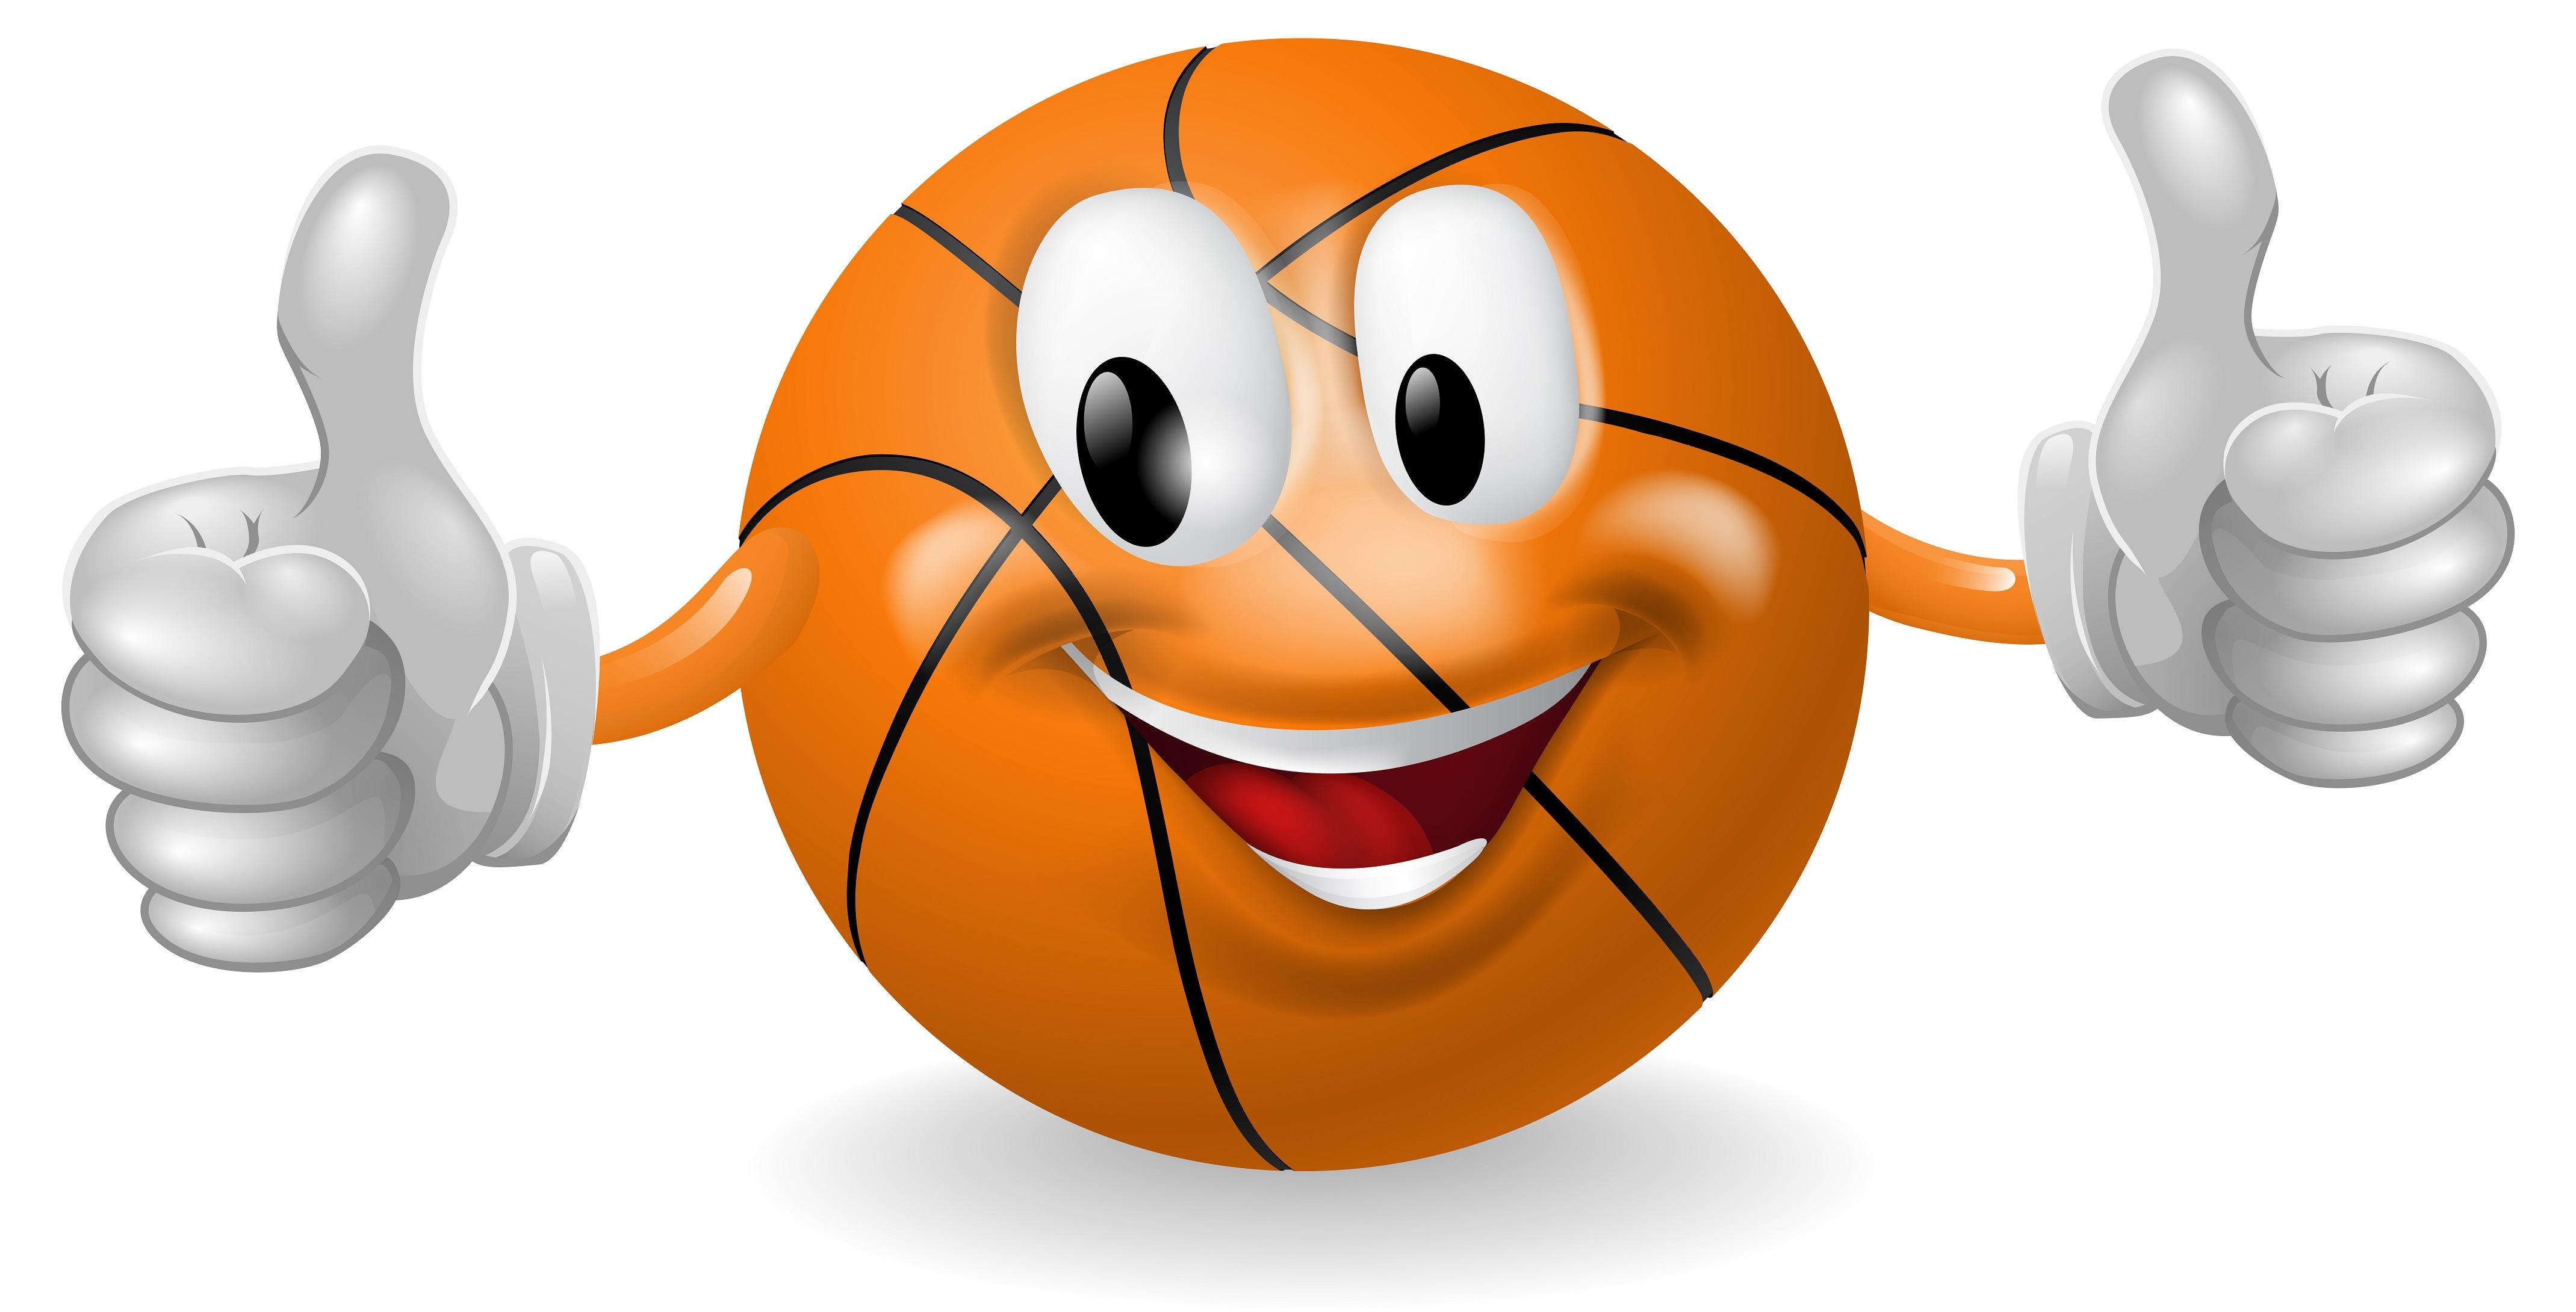 СеШельские Острова - Страница 40 Bxt-Ball-Thumbs-Up-2